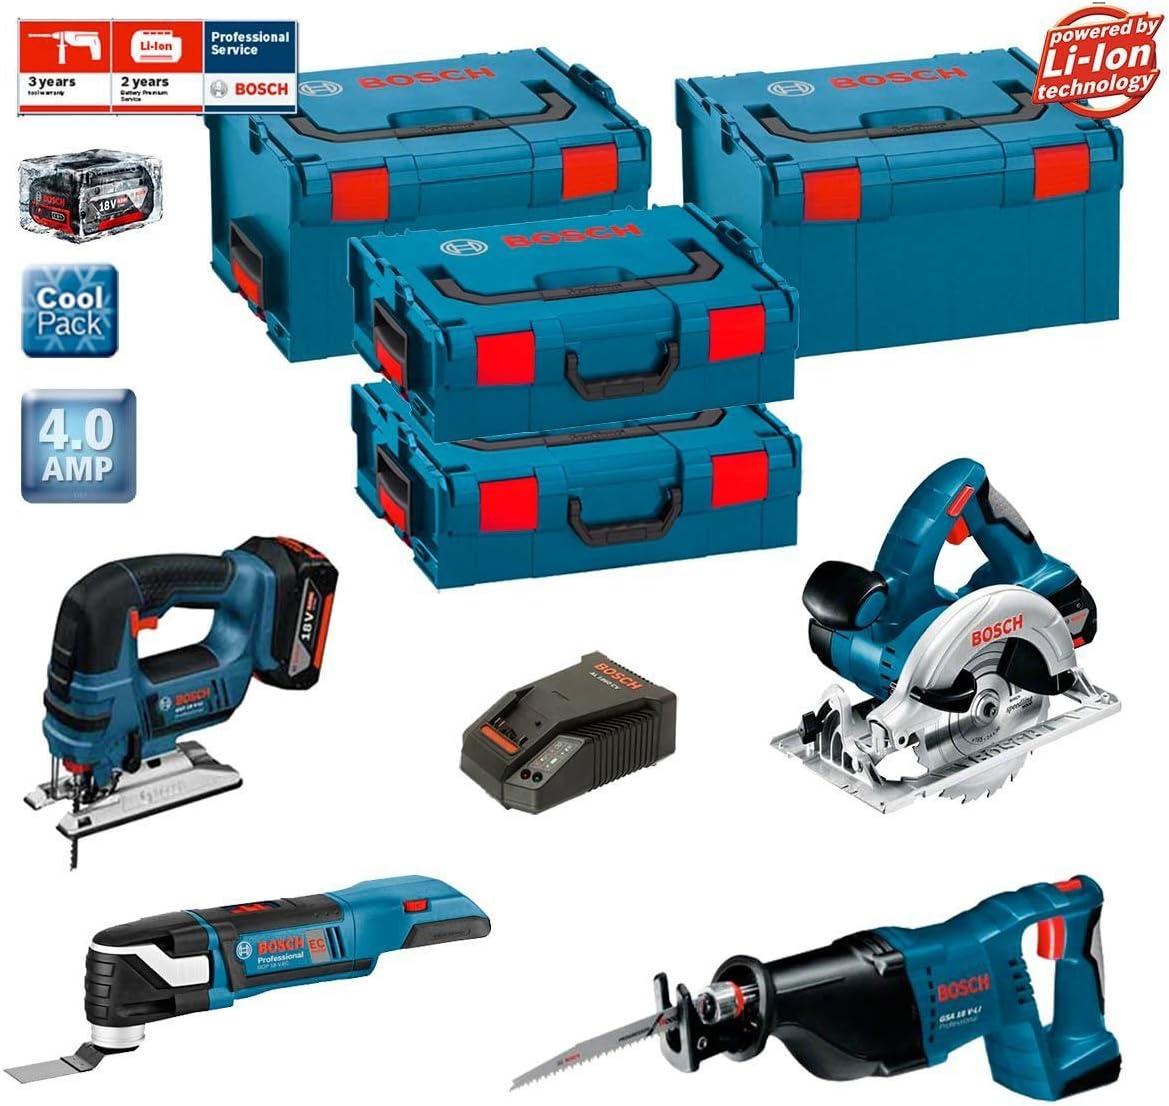 Bosch Kit psl4wggm2a Professional (GST 18V-LI + GKS 18V-Li + GSA 18V-LI + GOP 18V-EC + 2Baterías X 4,0Ah + 2x L-Boxx 238+ 2x L-Boxx 136+ Cargador AL1860CV): Amazon.es: Bricolaje y herramientas